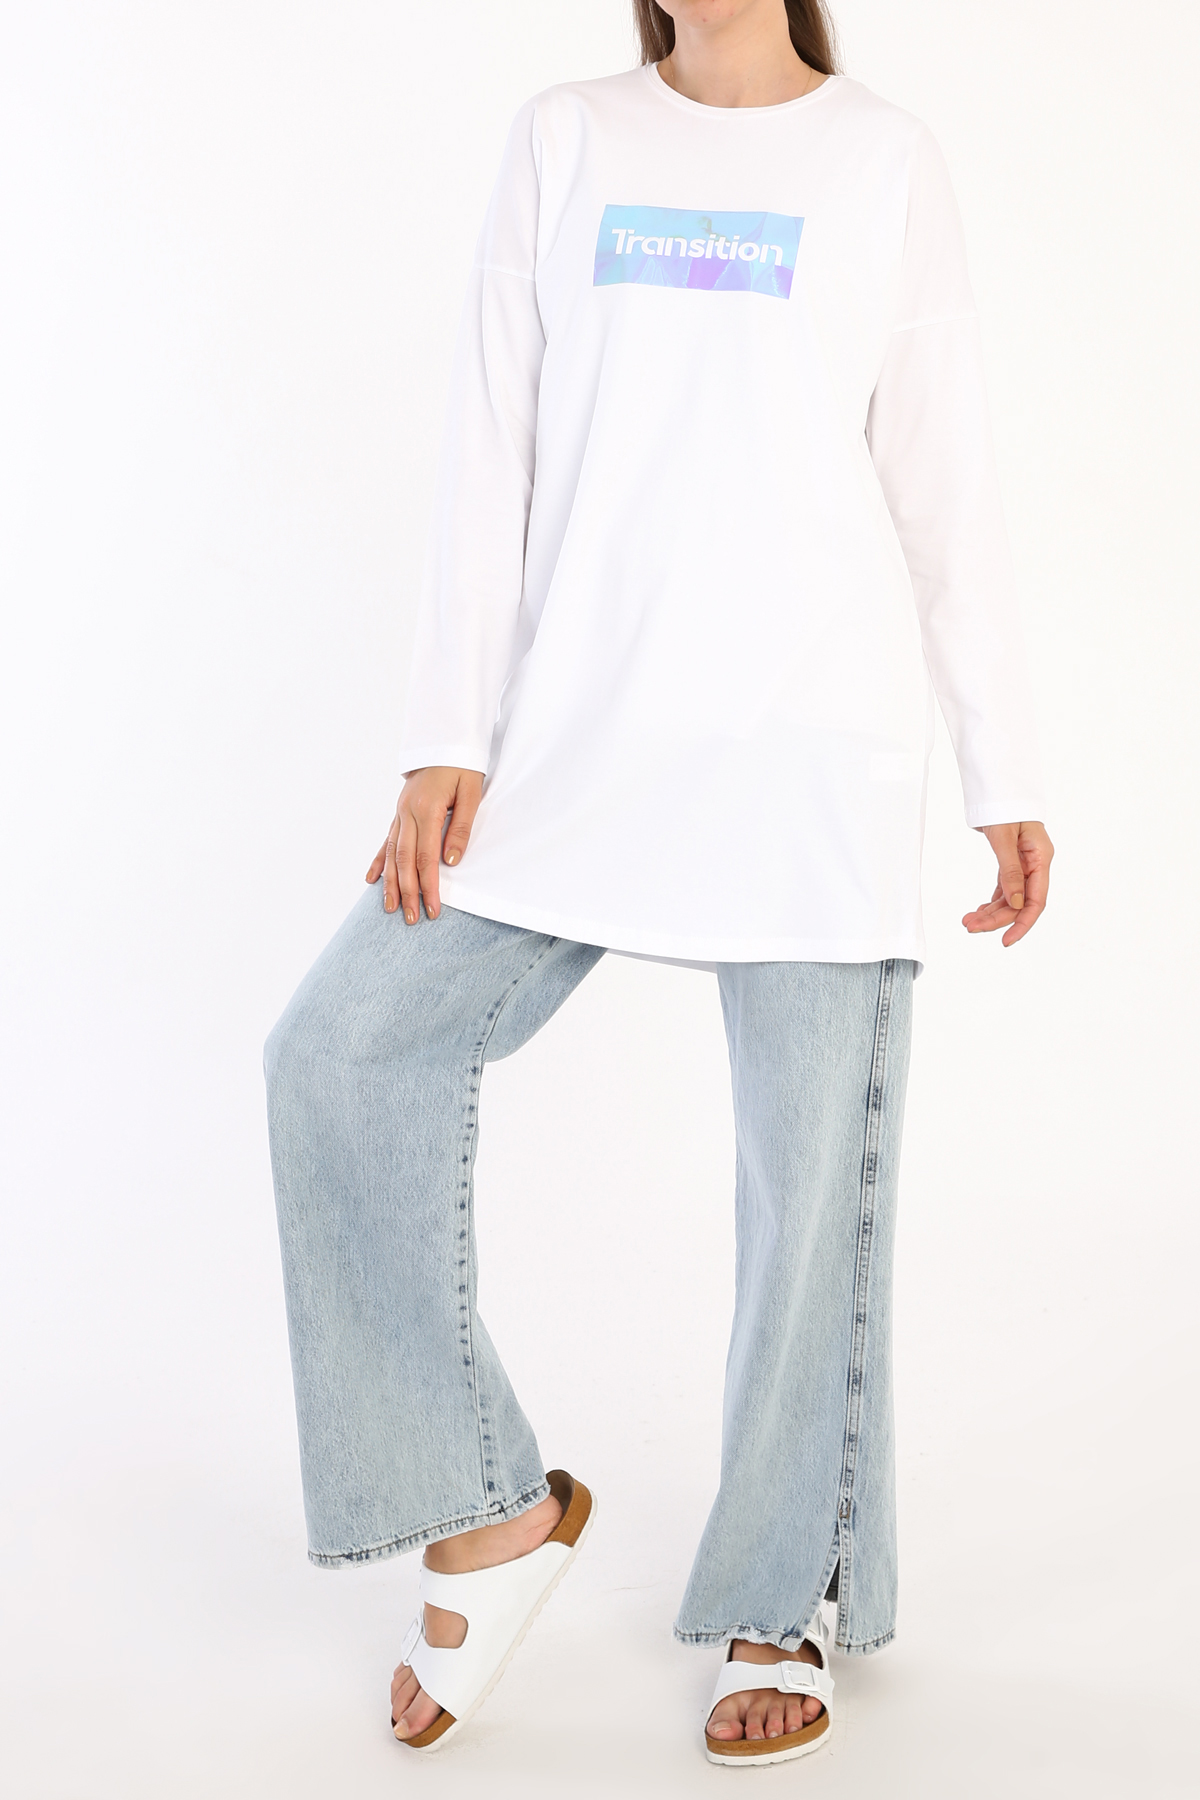 Comfy Transition Printed Long Sleeve T-Shirt Tunic